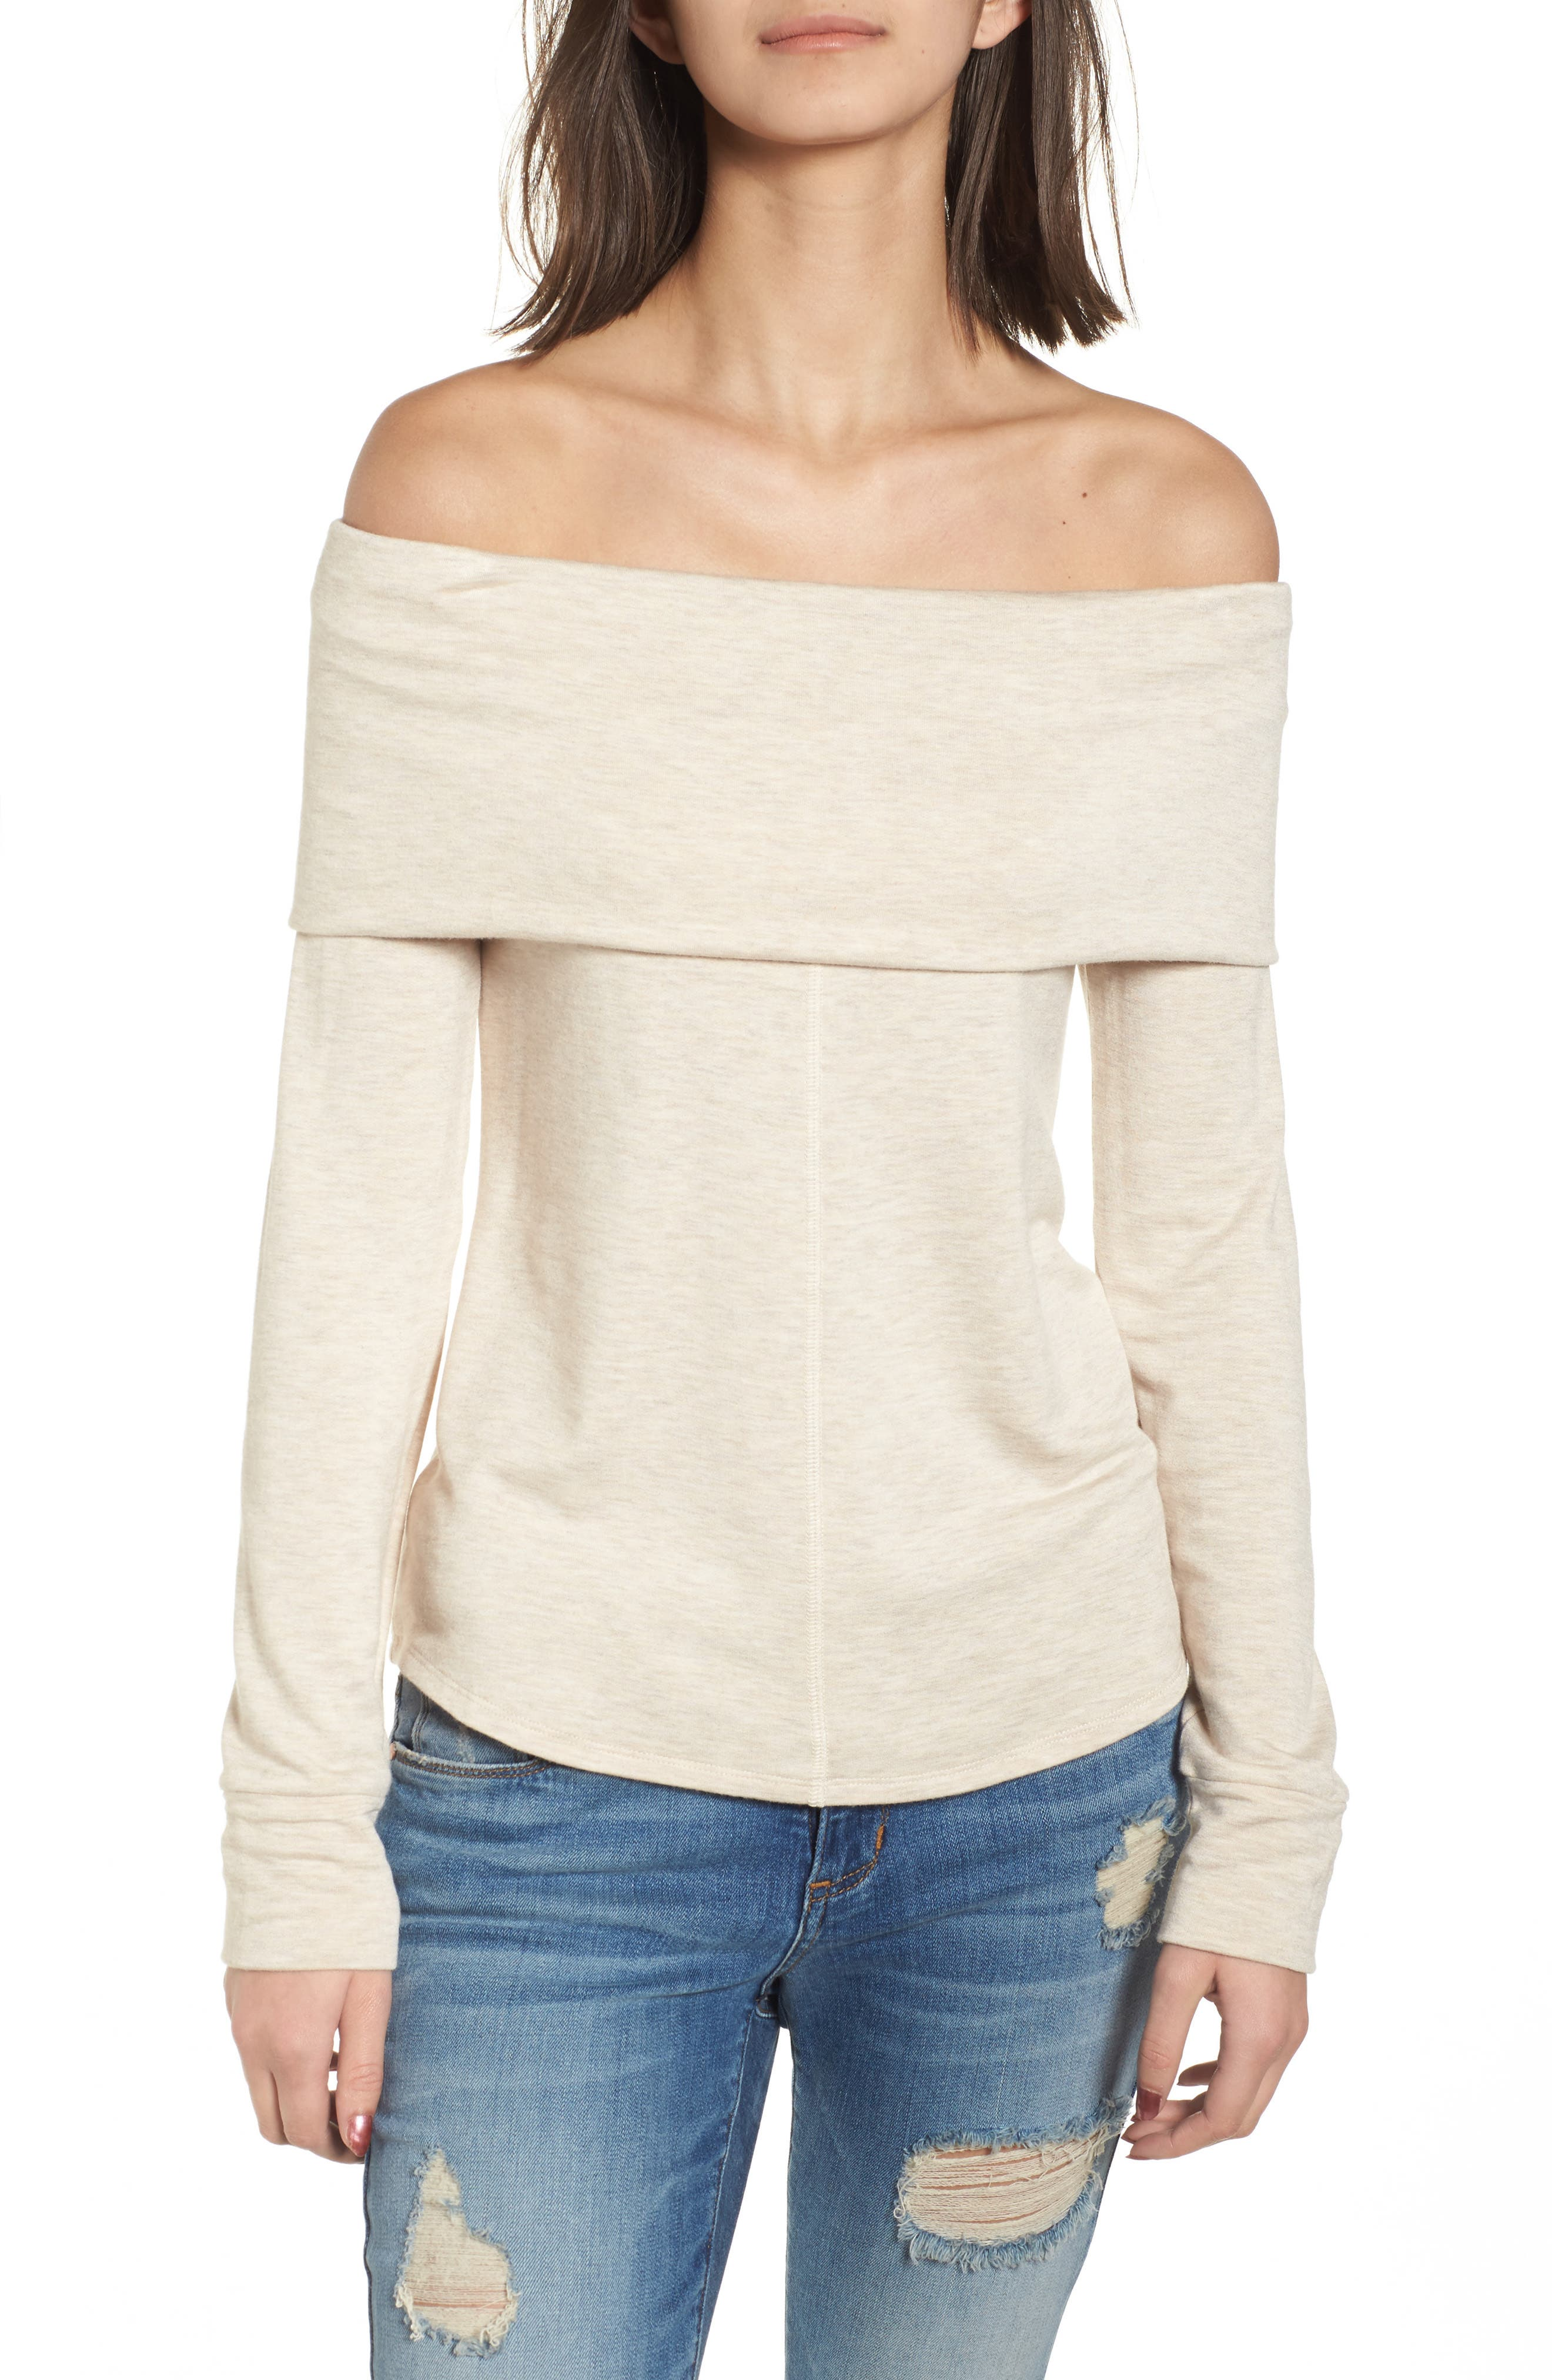 Main Image - Socialite Foldover Off the Shoulder Top